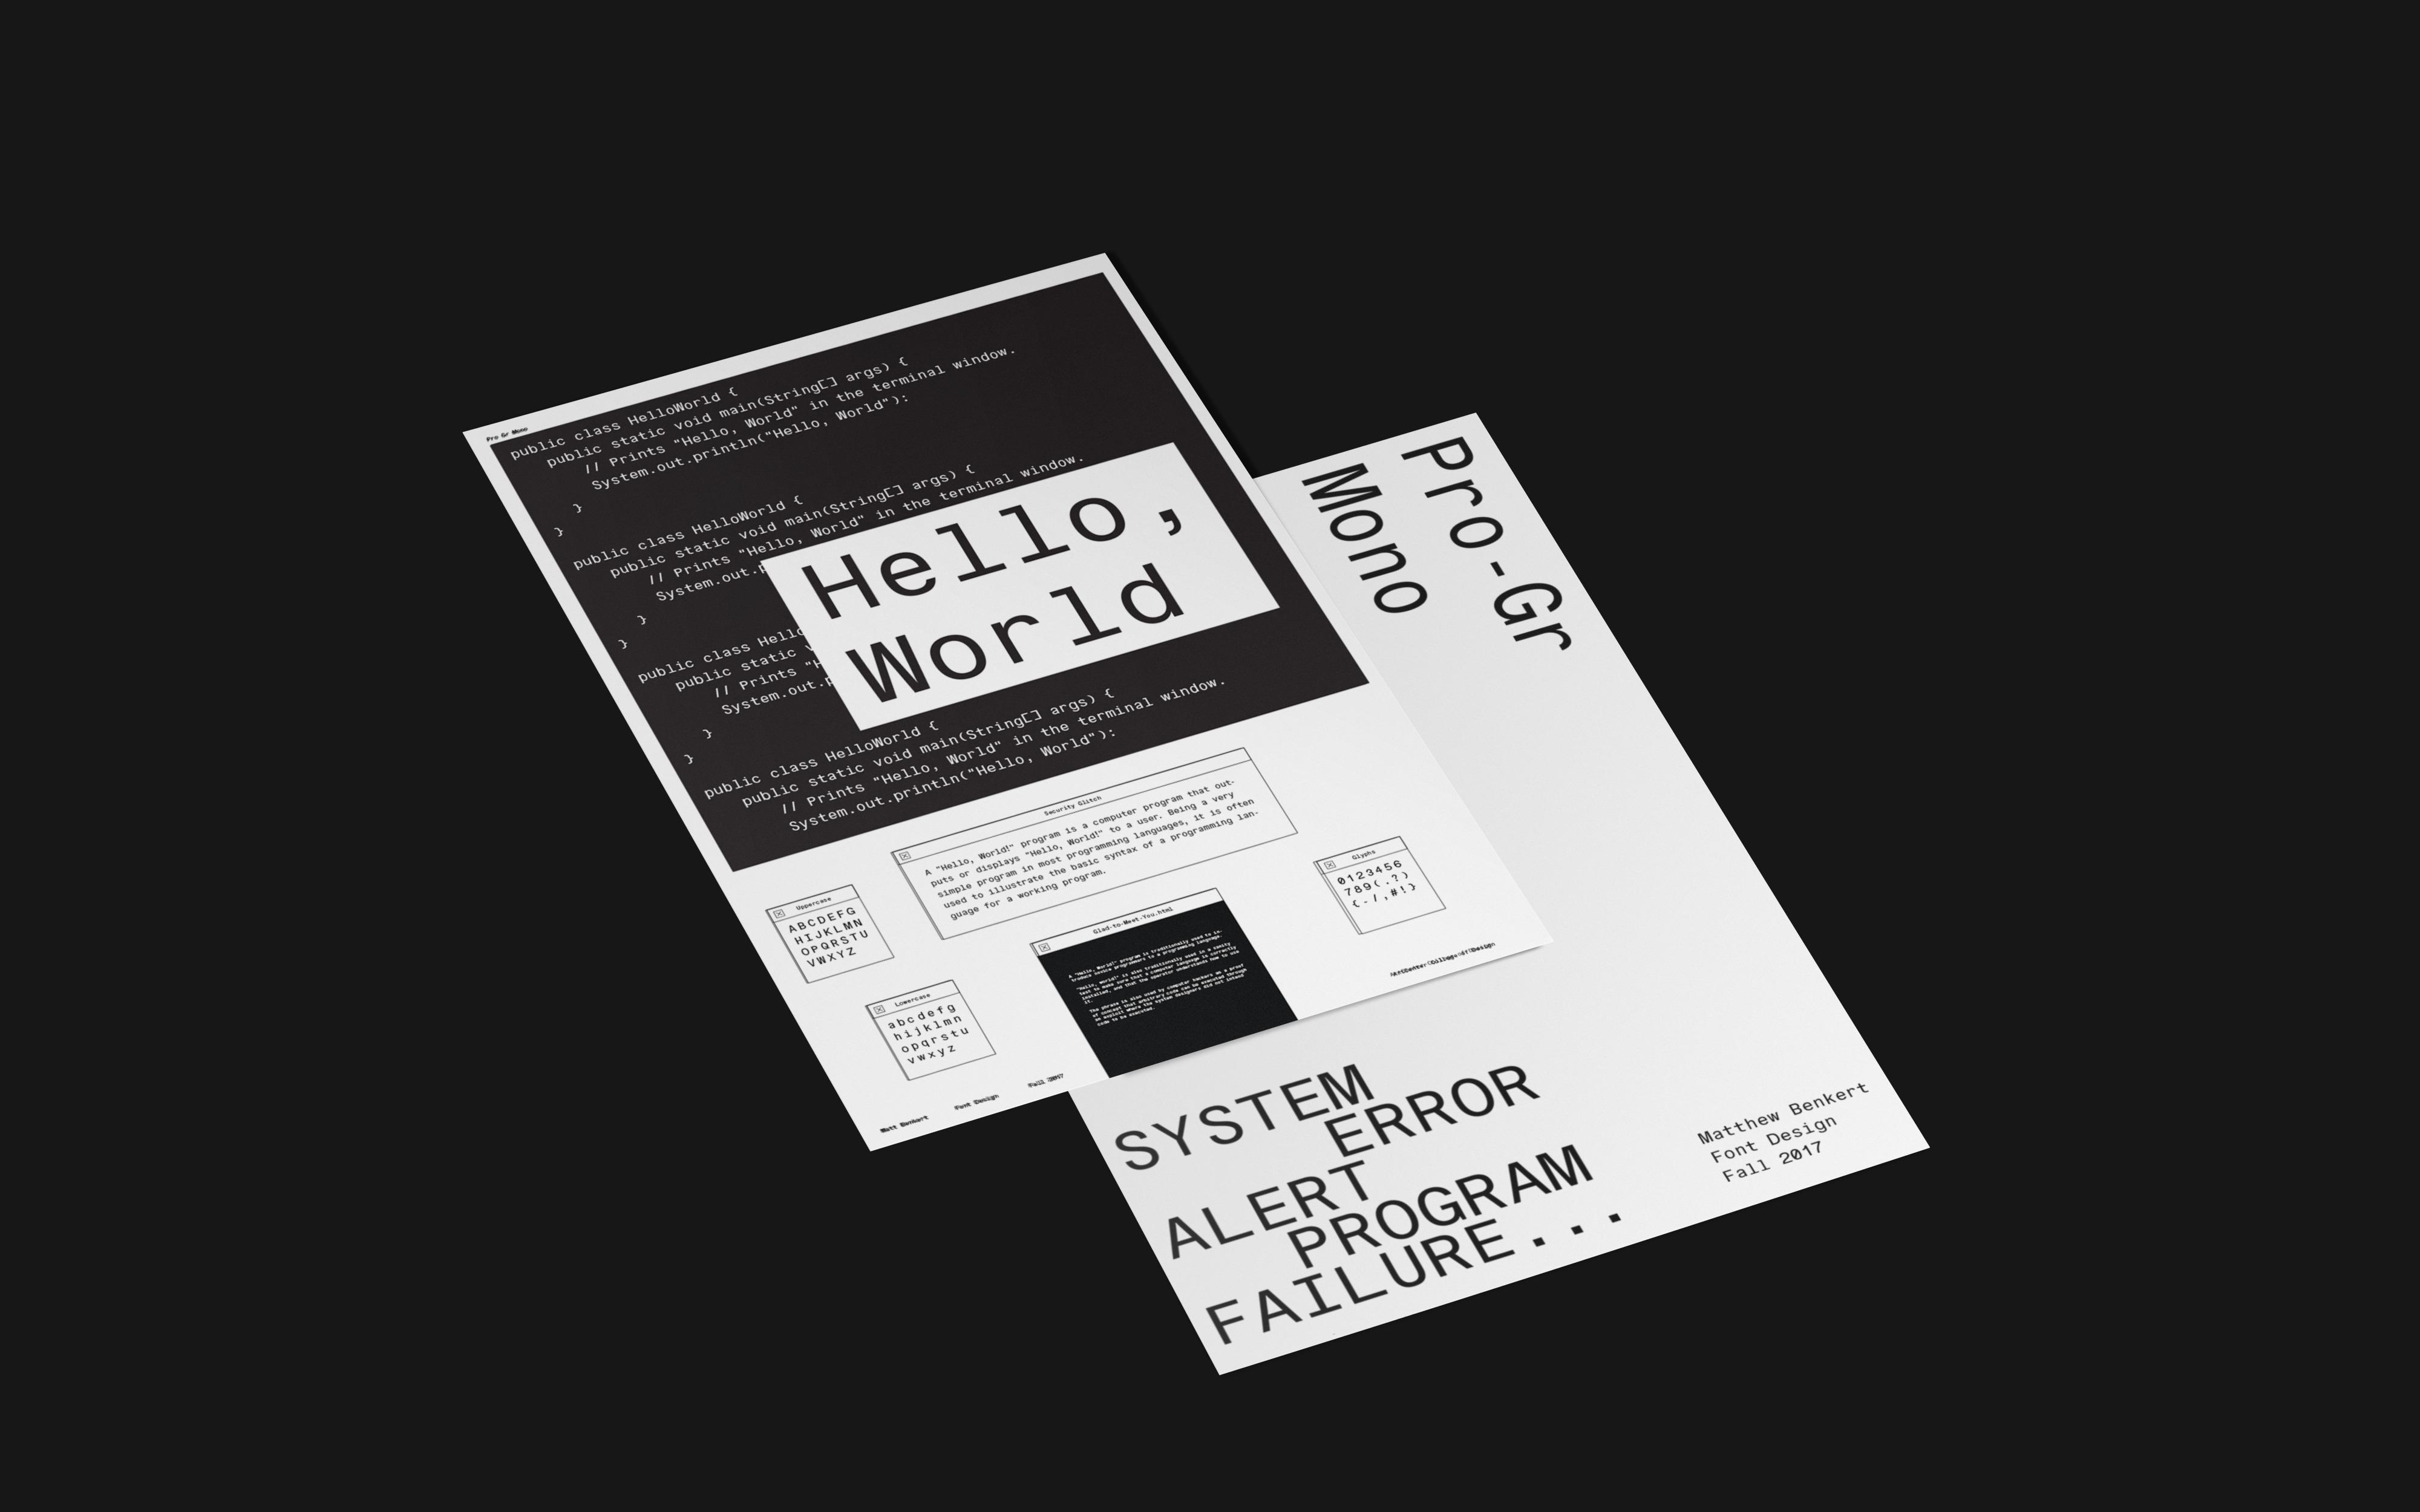 017-FontDesign_ProGrMono_DoublePosterMockup-2018-03-10-v01_55